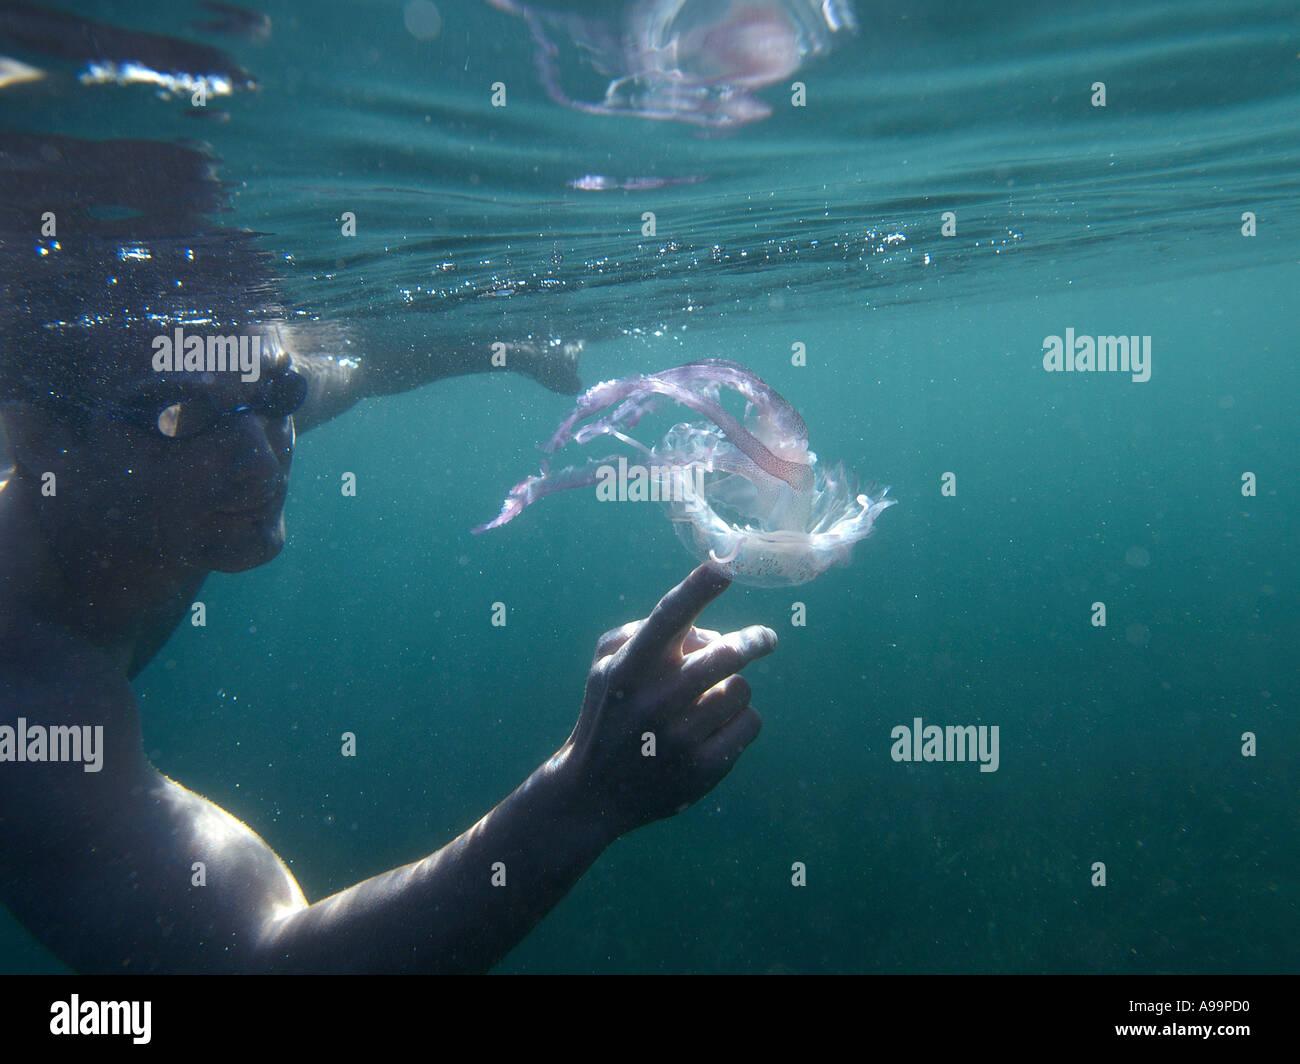 Jellyfish and swimmer Stock Photo